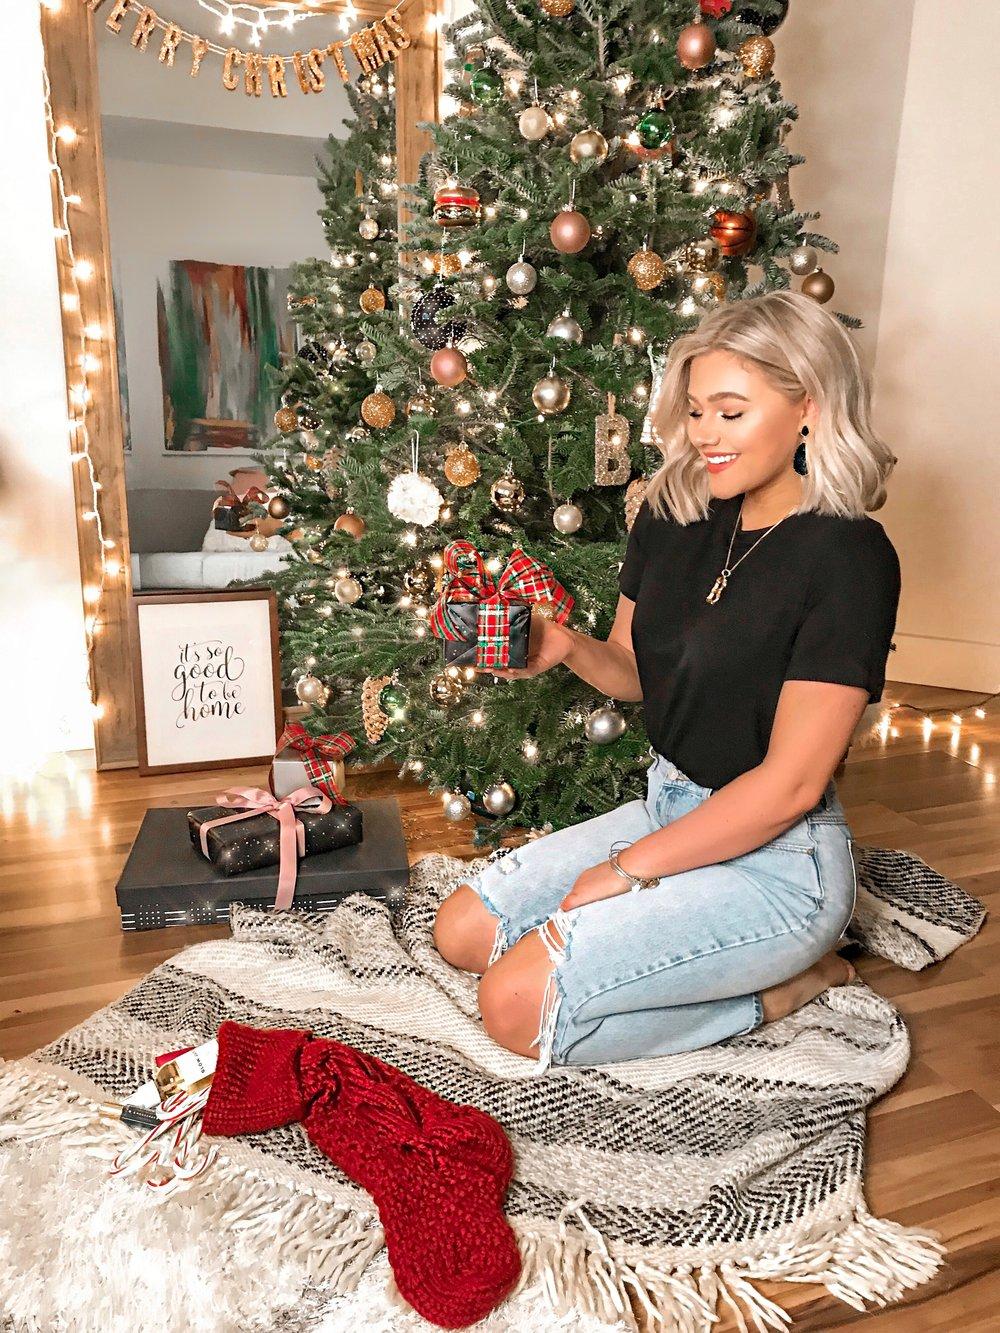 Amazon Handmade Giftguide - Bre Sheppard : Holiday Inspo : Christmas Tree : Inspo.jpg